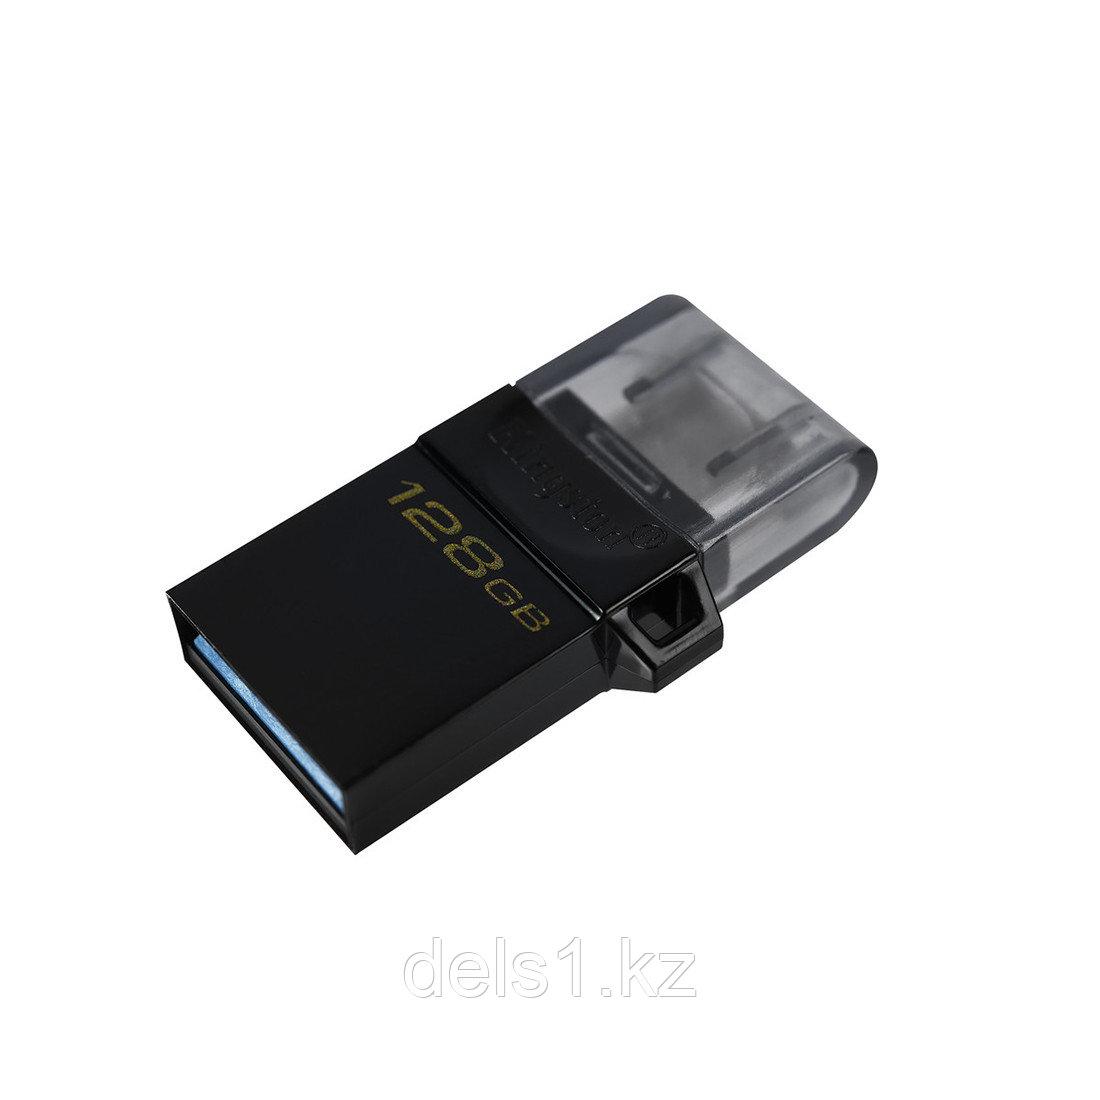 USB-накопитель Kingston DTDUO3G2/128GB 128GB Чёрный